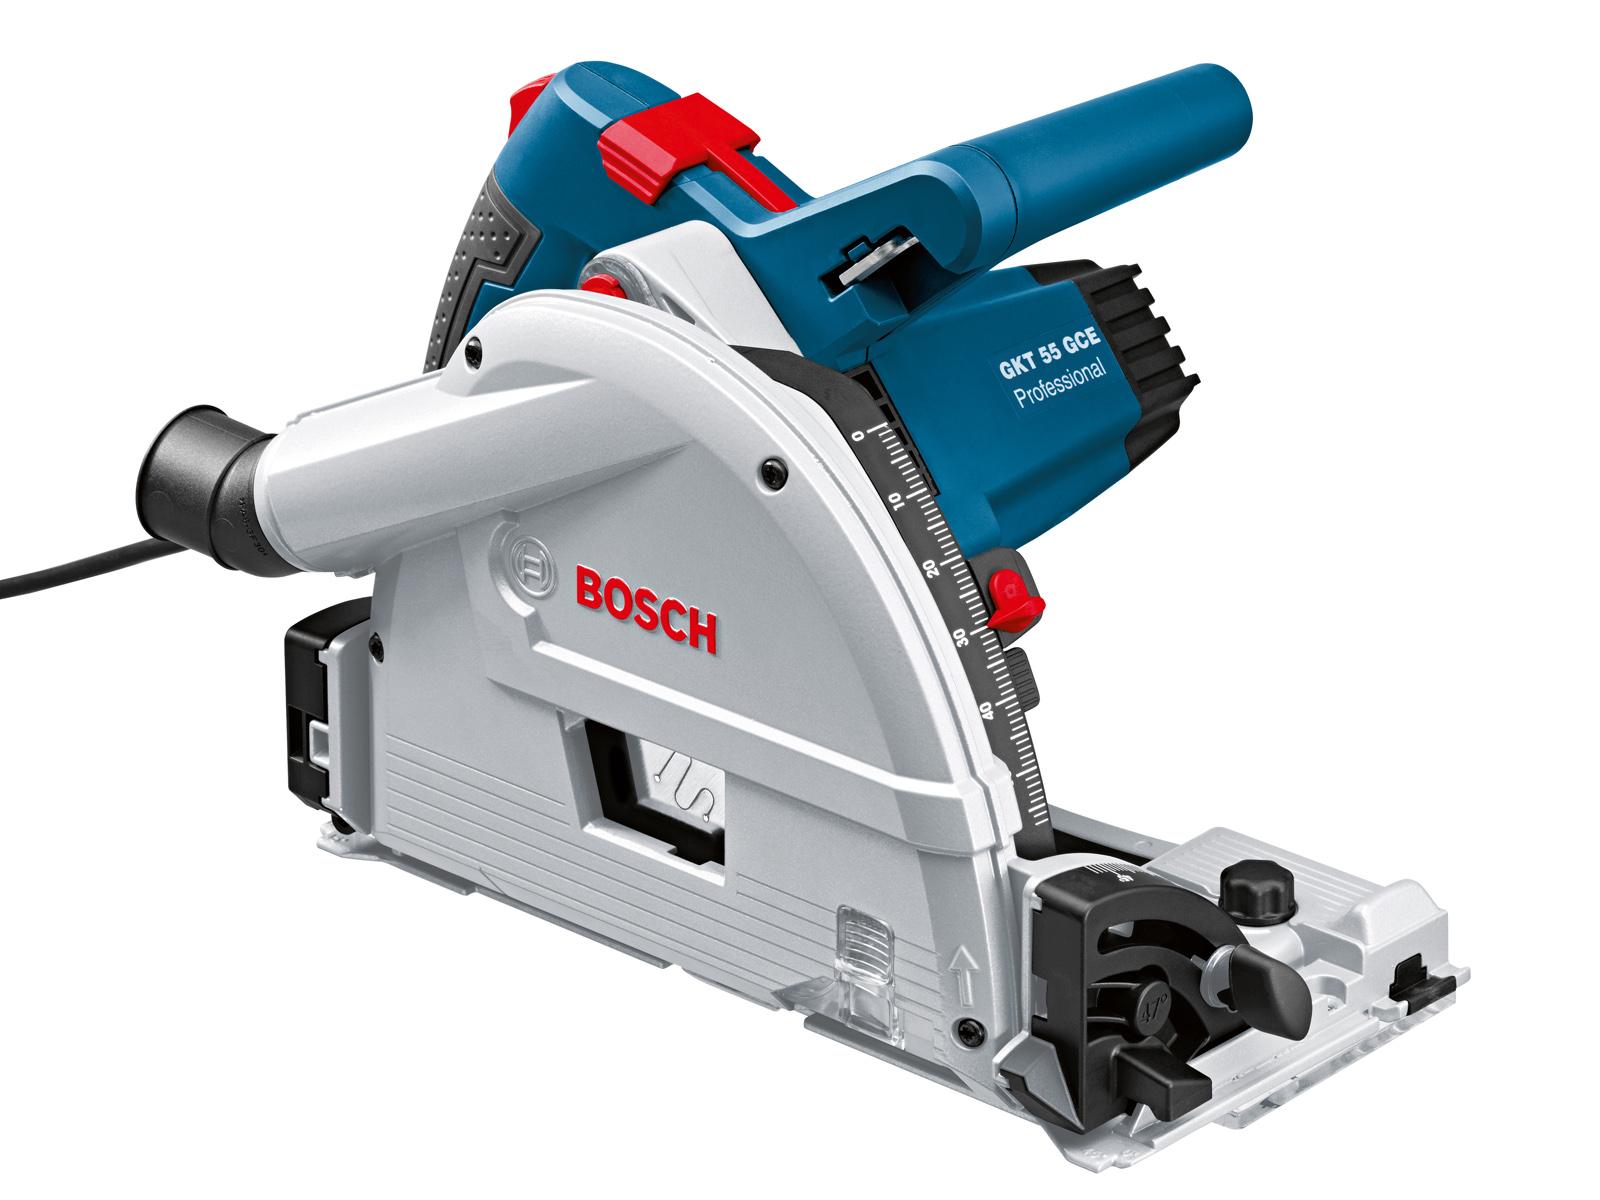 Погружная циркулярная пила  Bosch Gkt 55 gce l-boxx